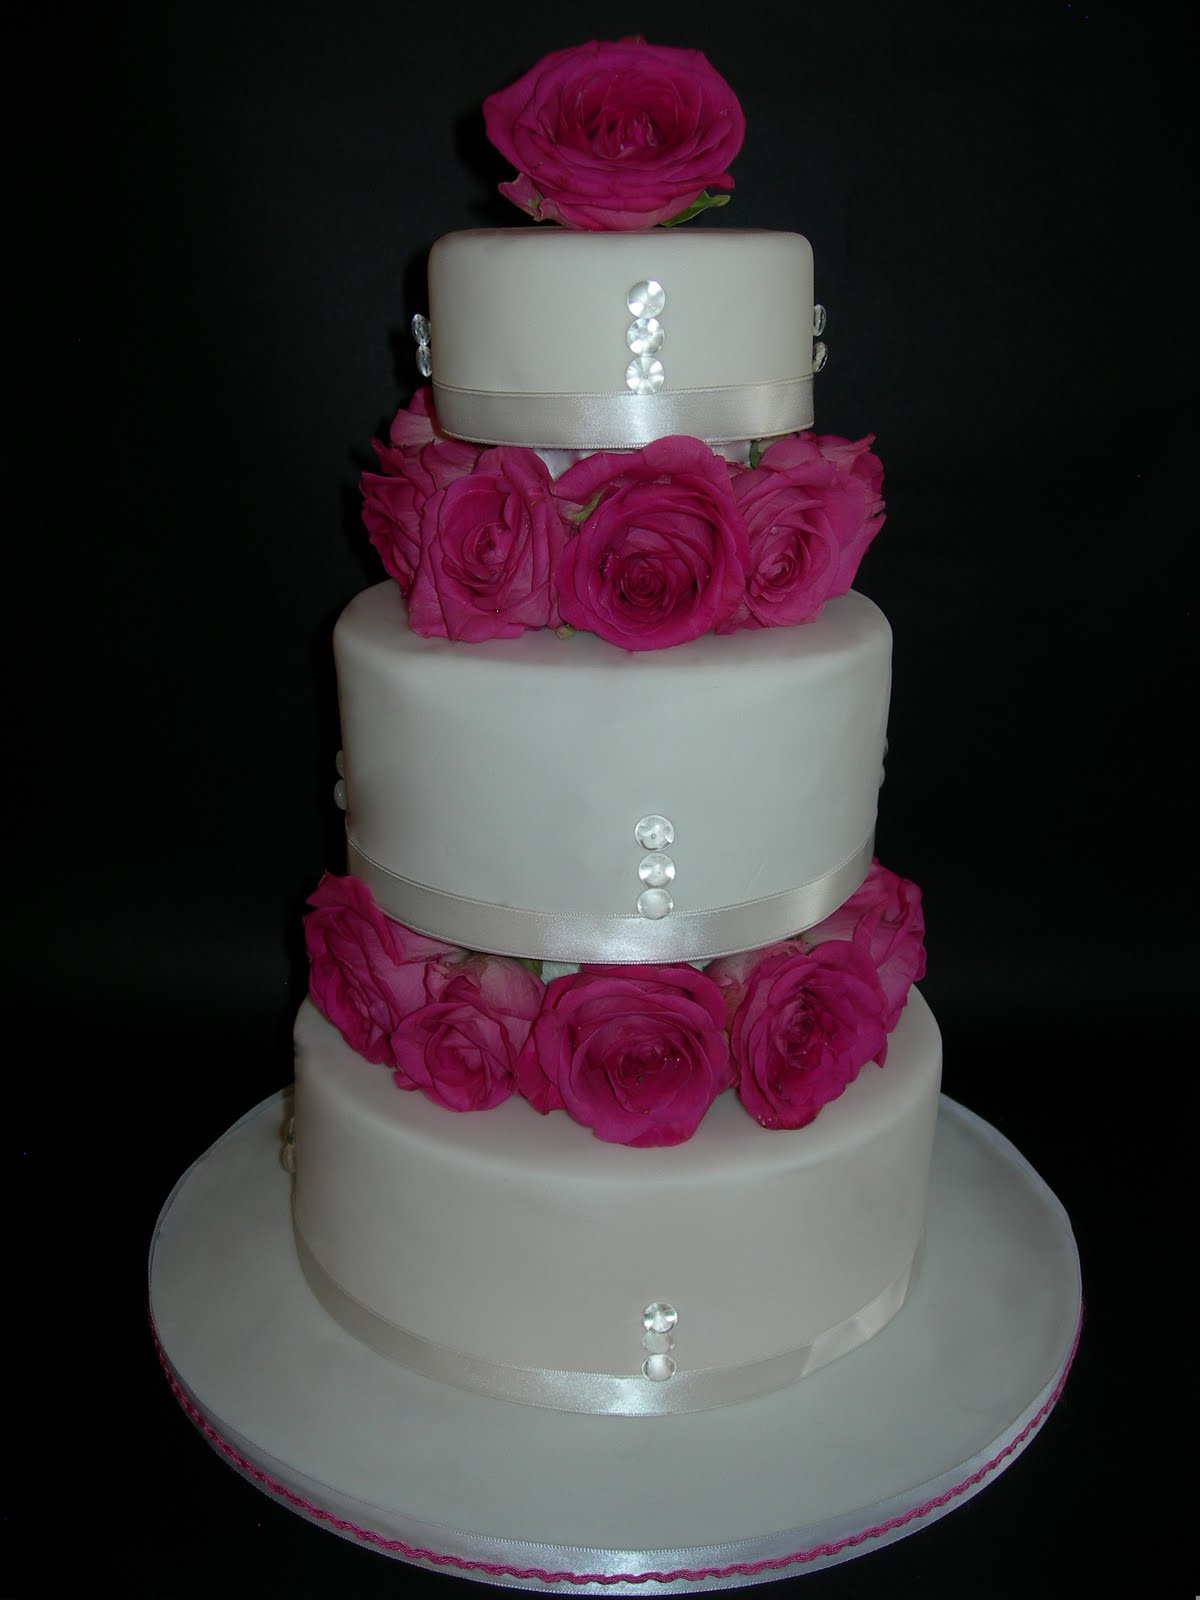 Custom Cake Designs Uk : Custom Cake Design: Pink flower tower